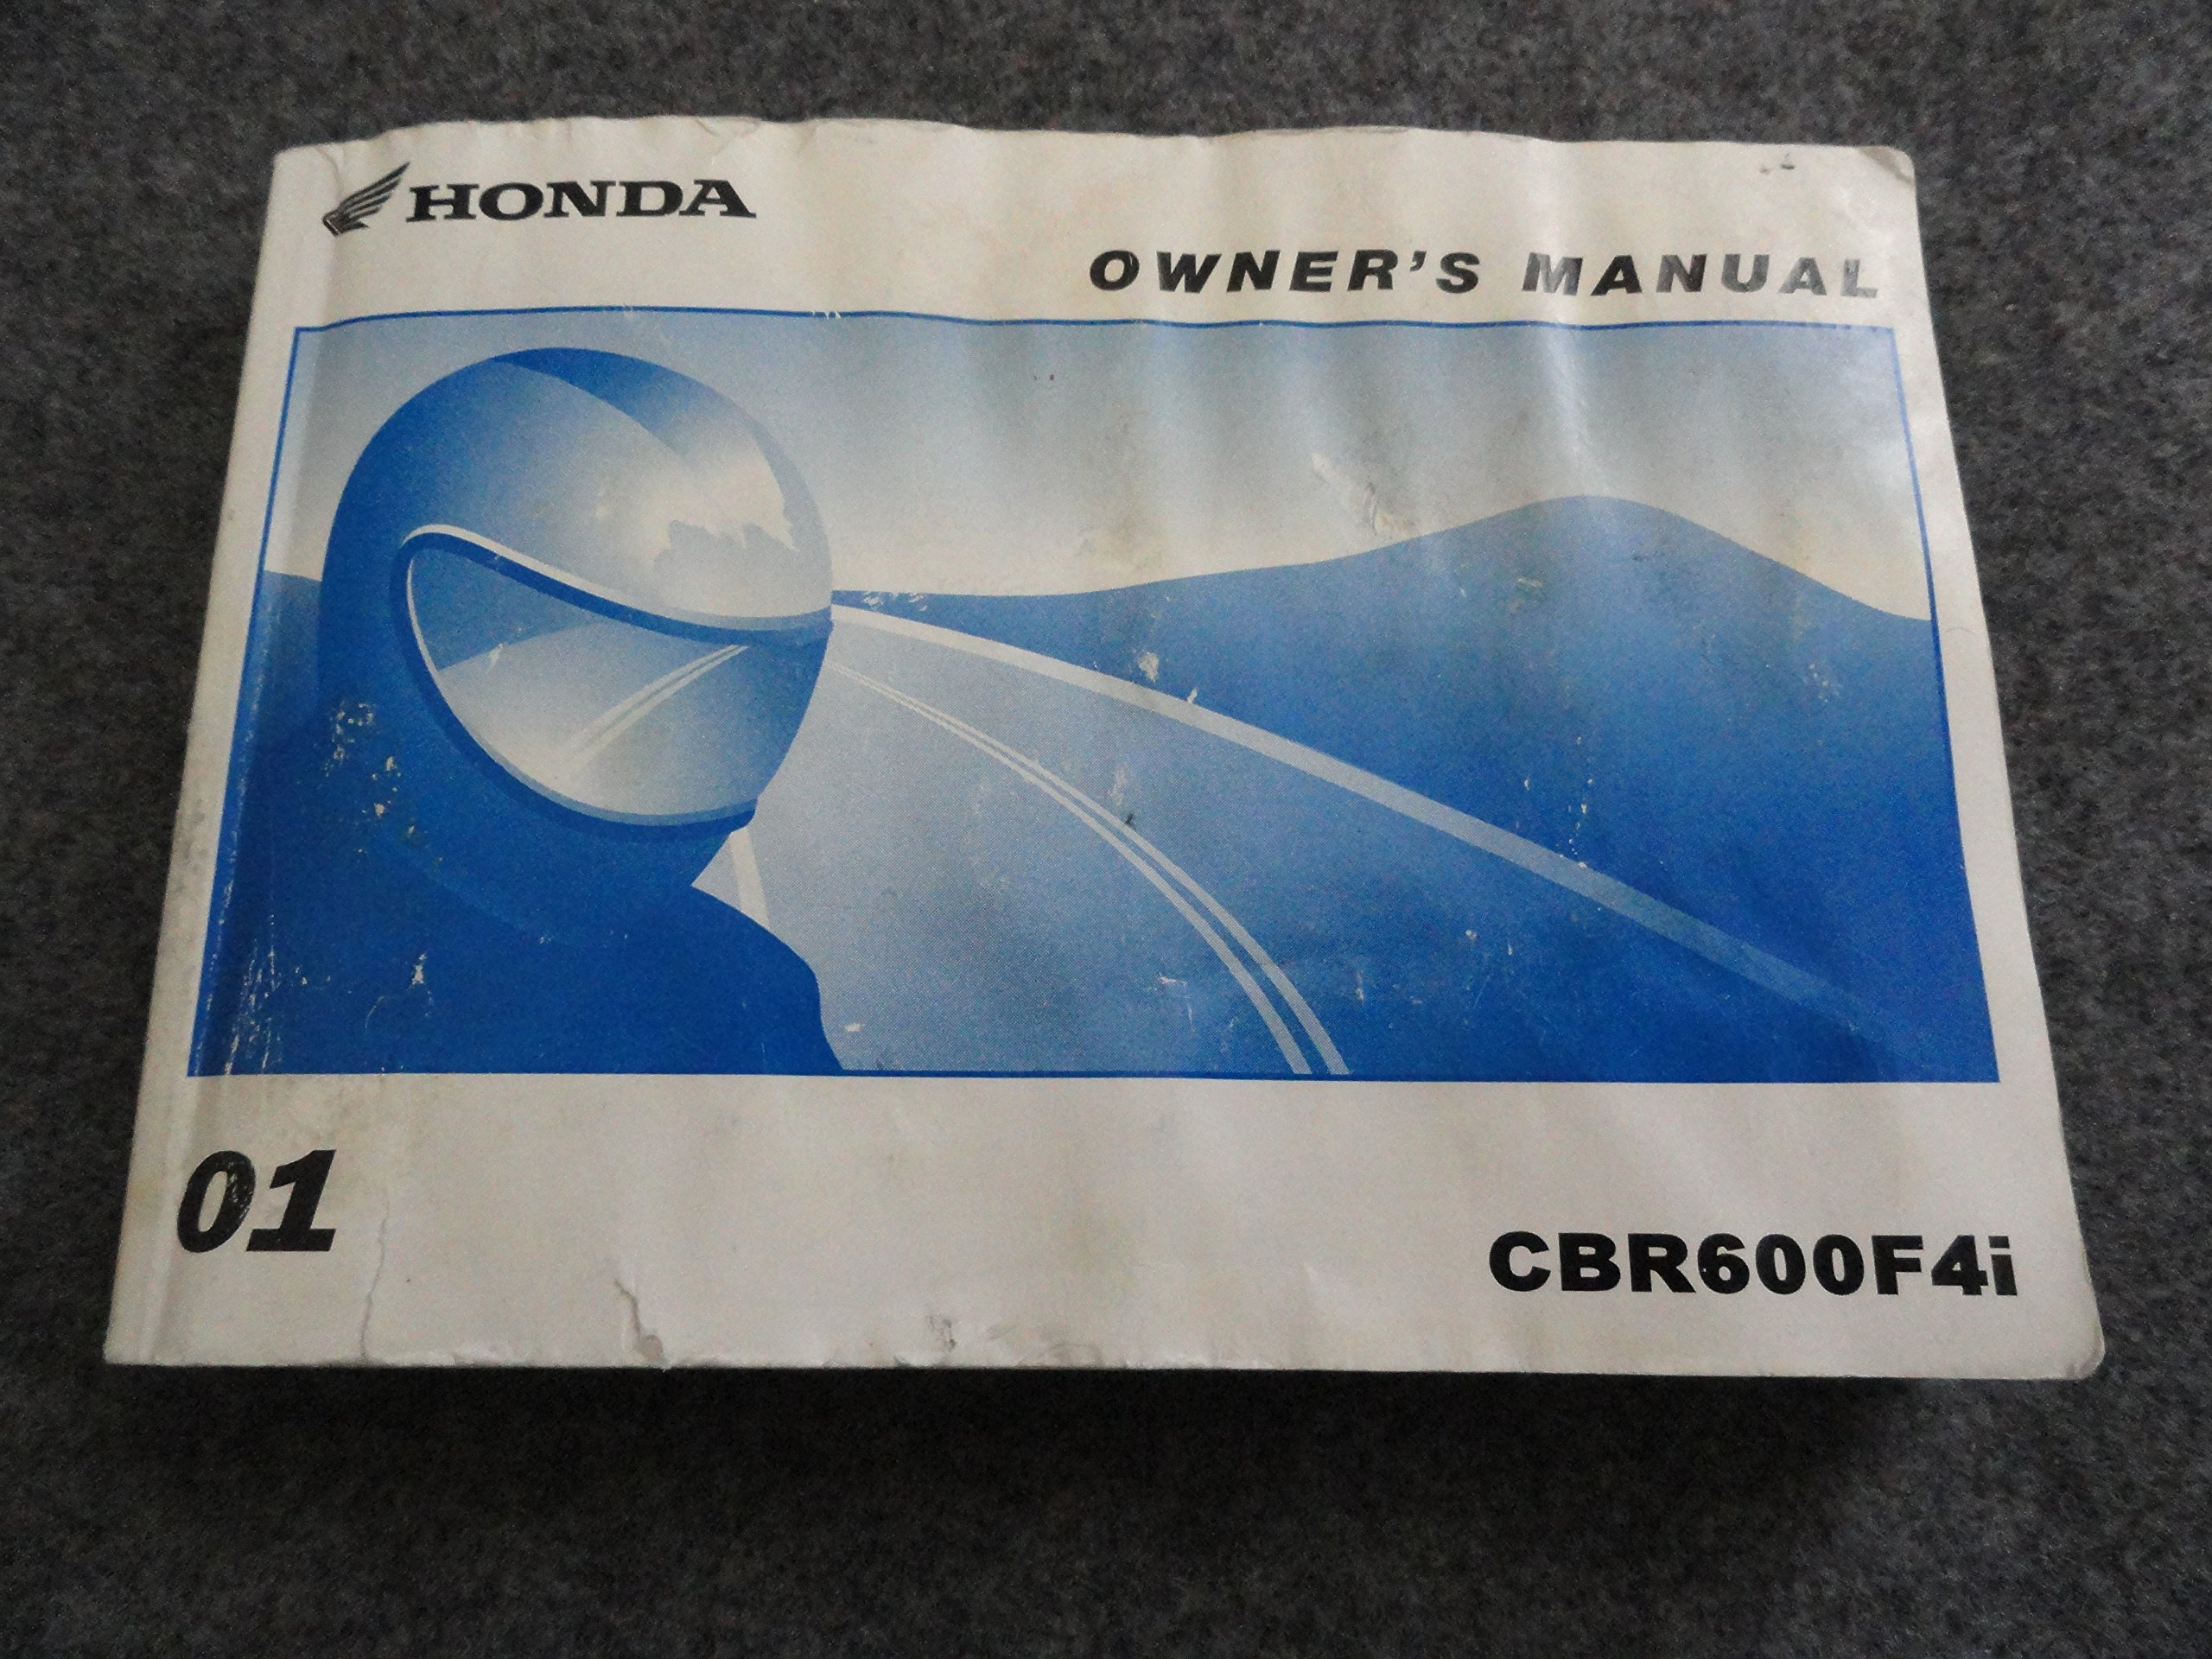 2006 honda cbr600f4i motorcycle owners manual: 31mbw670 | ebay.